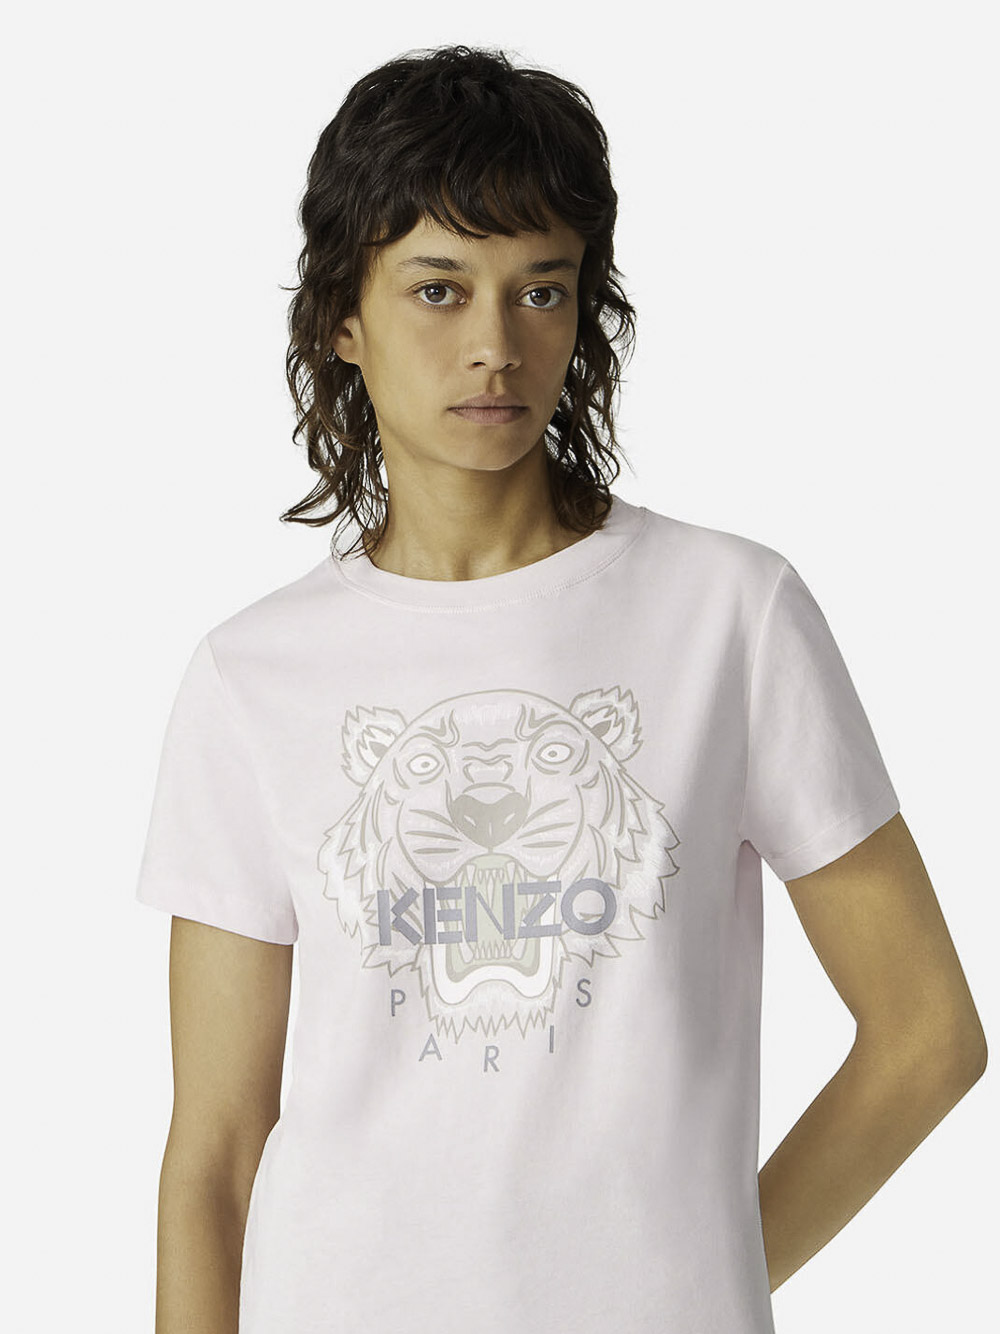 KENZO Μπλούζα t-shirt 2TS8484YB-34 ΡΟΖ